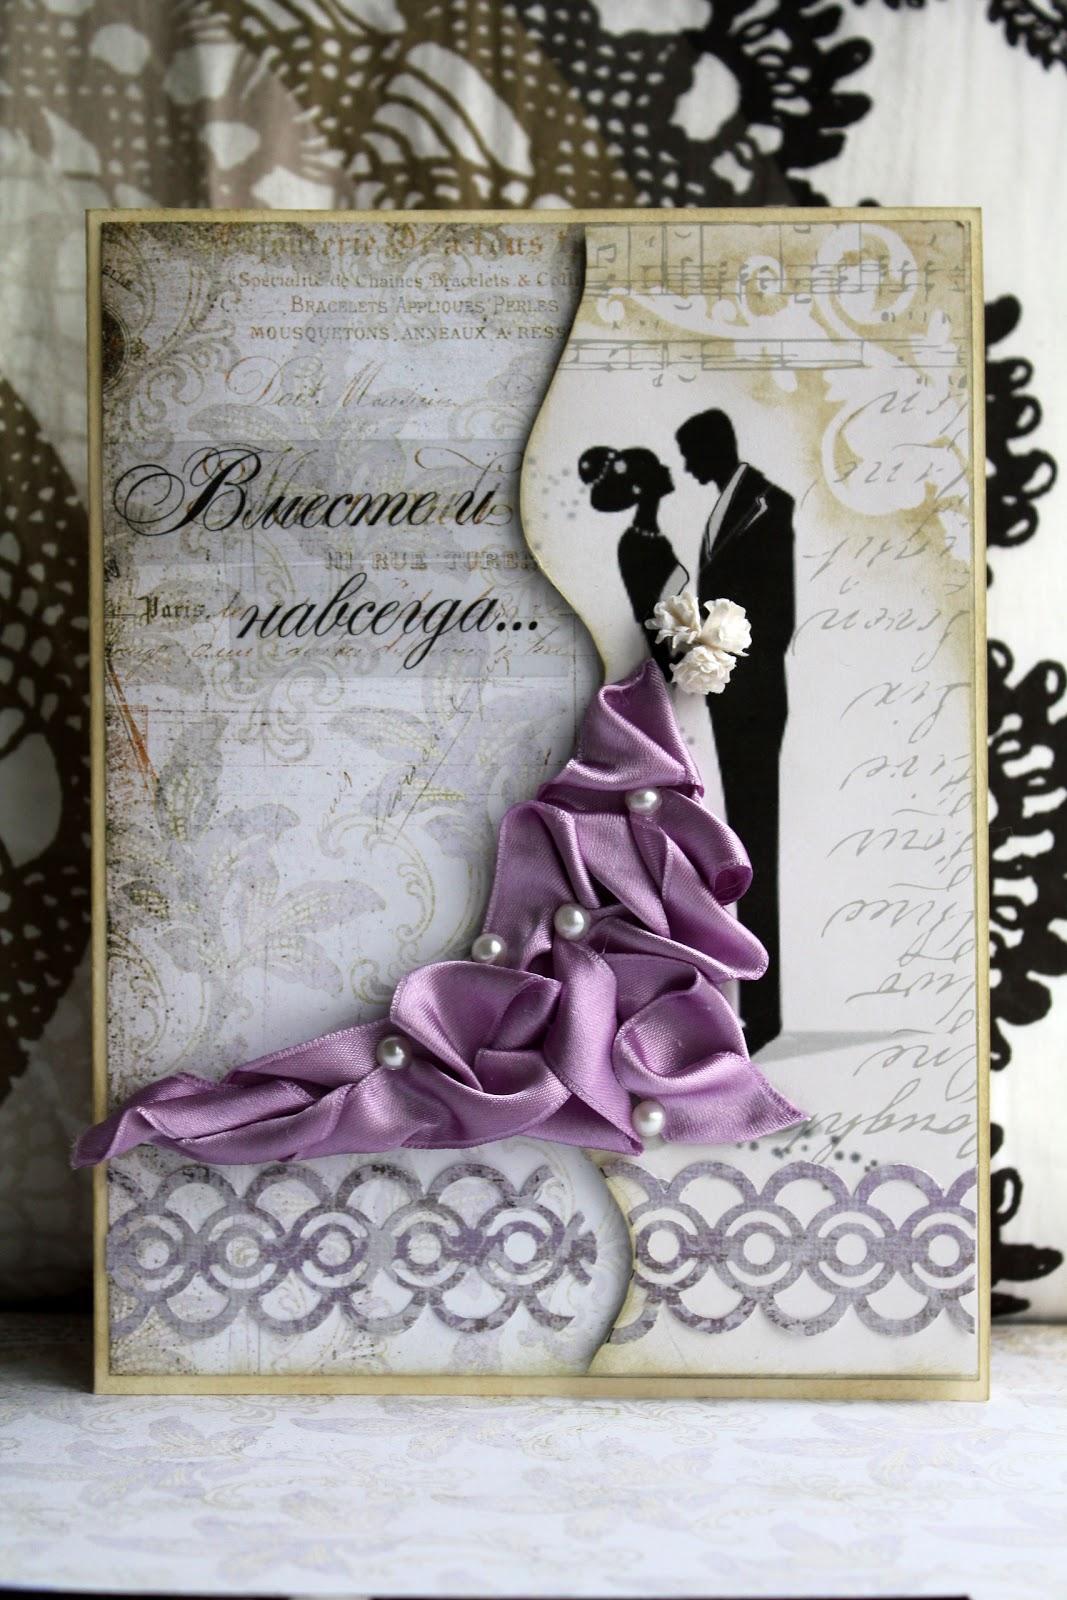 kart-davetiye-dugun-evlilik-kagit-saten-kurdela-inci